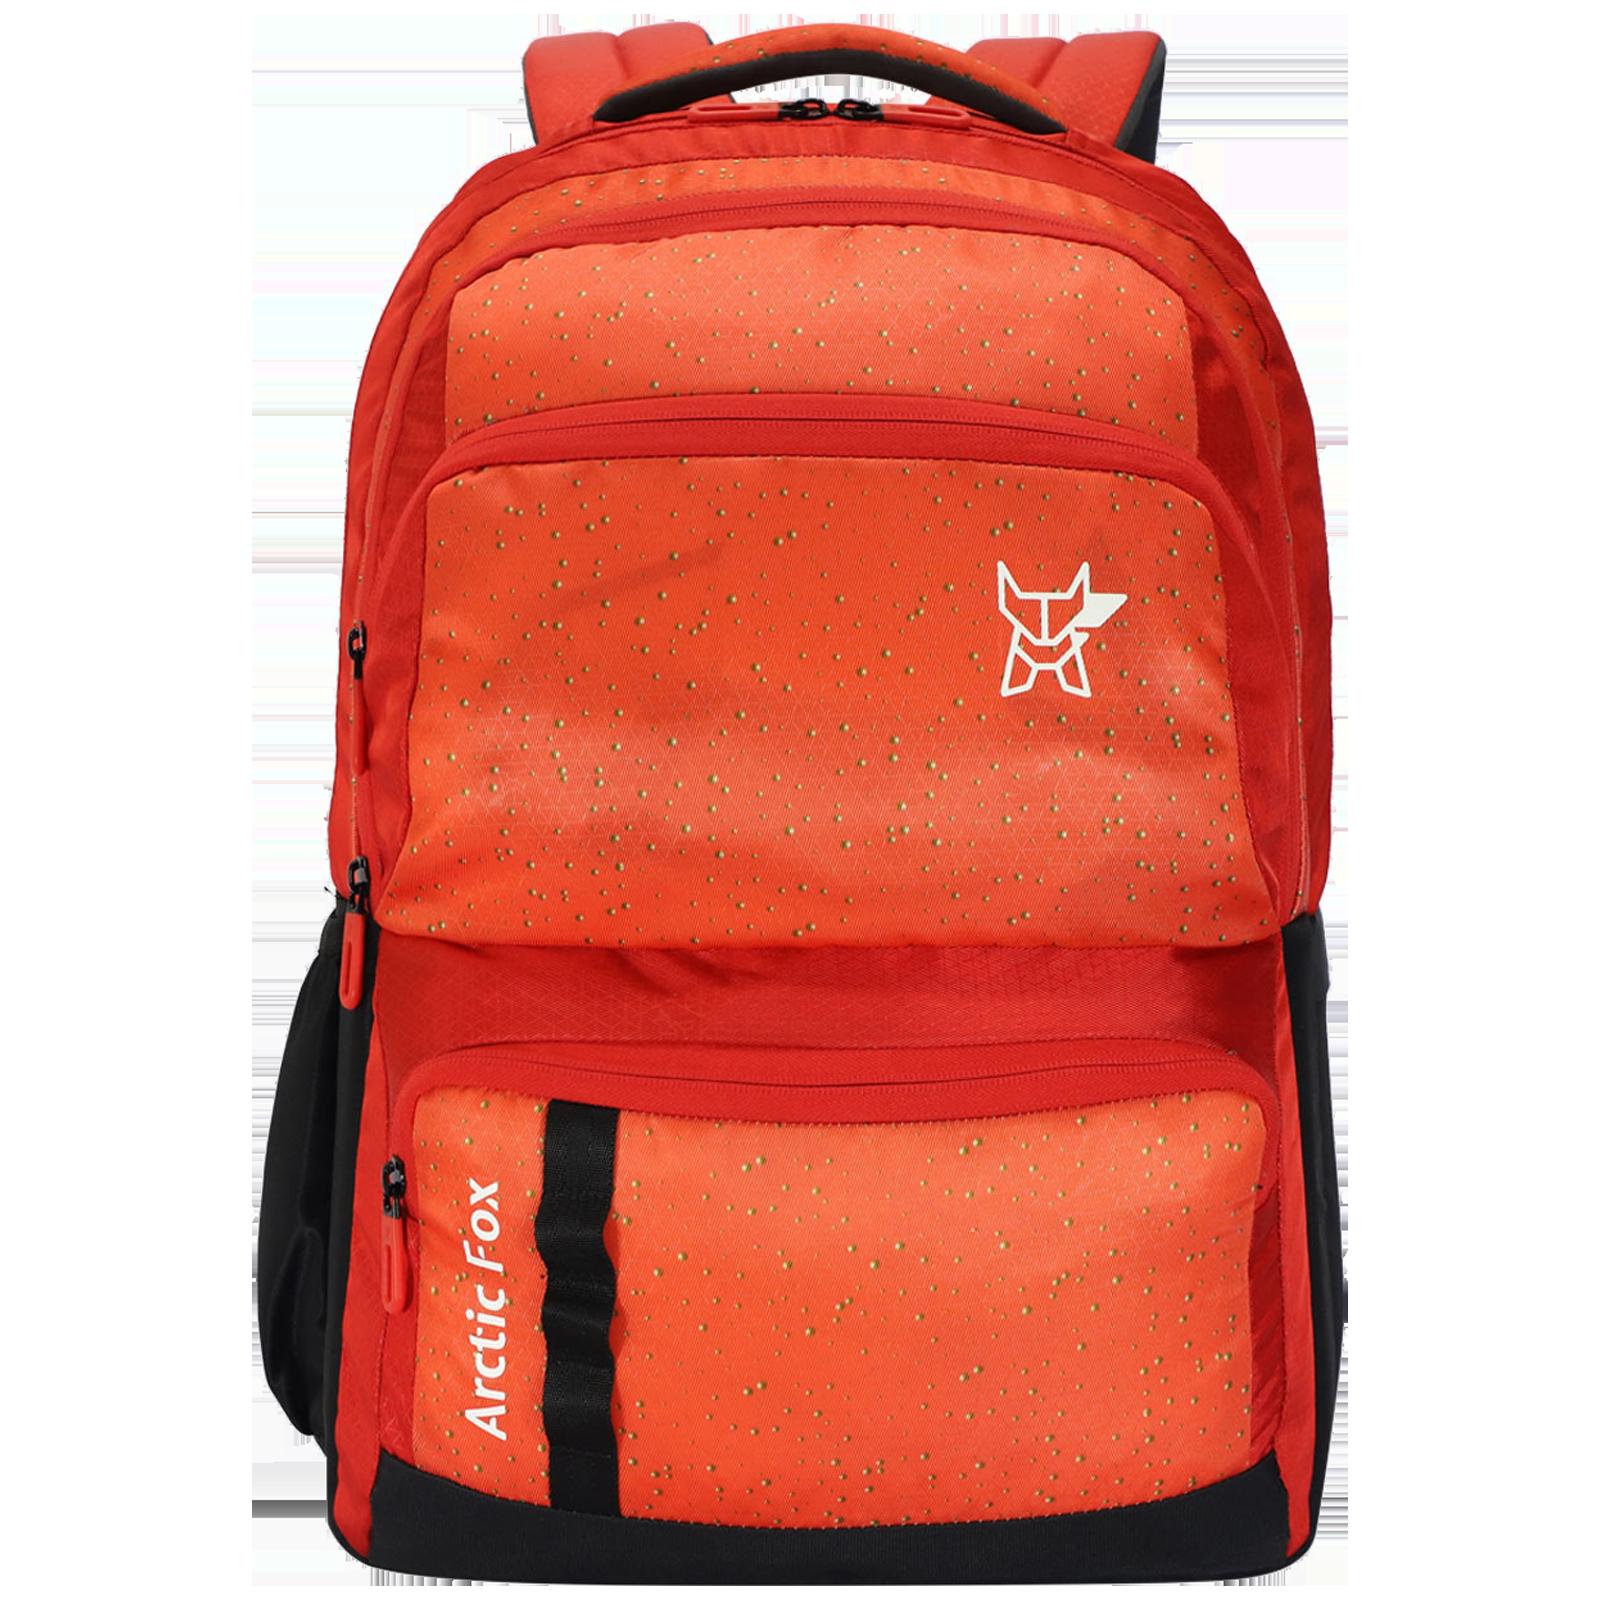 Arctic Fox Gold Mine 32 Litres Polyester Backpack for 15 Inch Laptop (Adjustable Straps, FUNBPKHCRON104032, Orange)_1